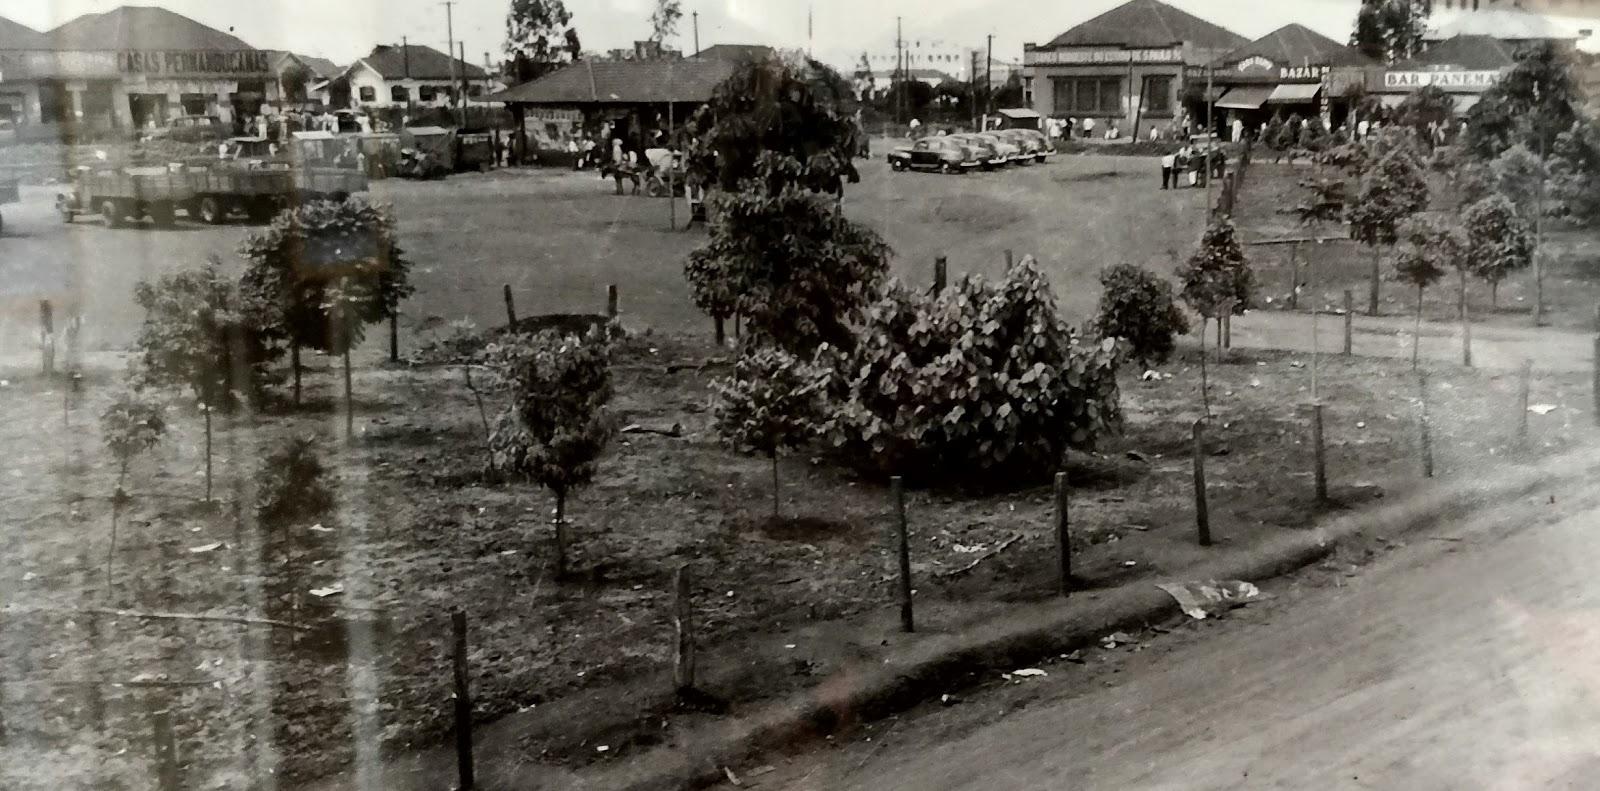 Praça da Rodoviária - 1952